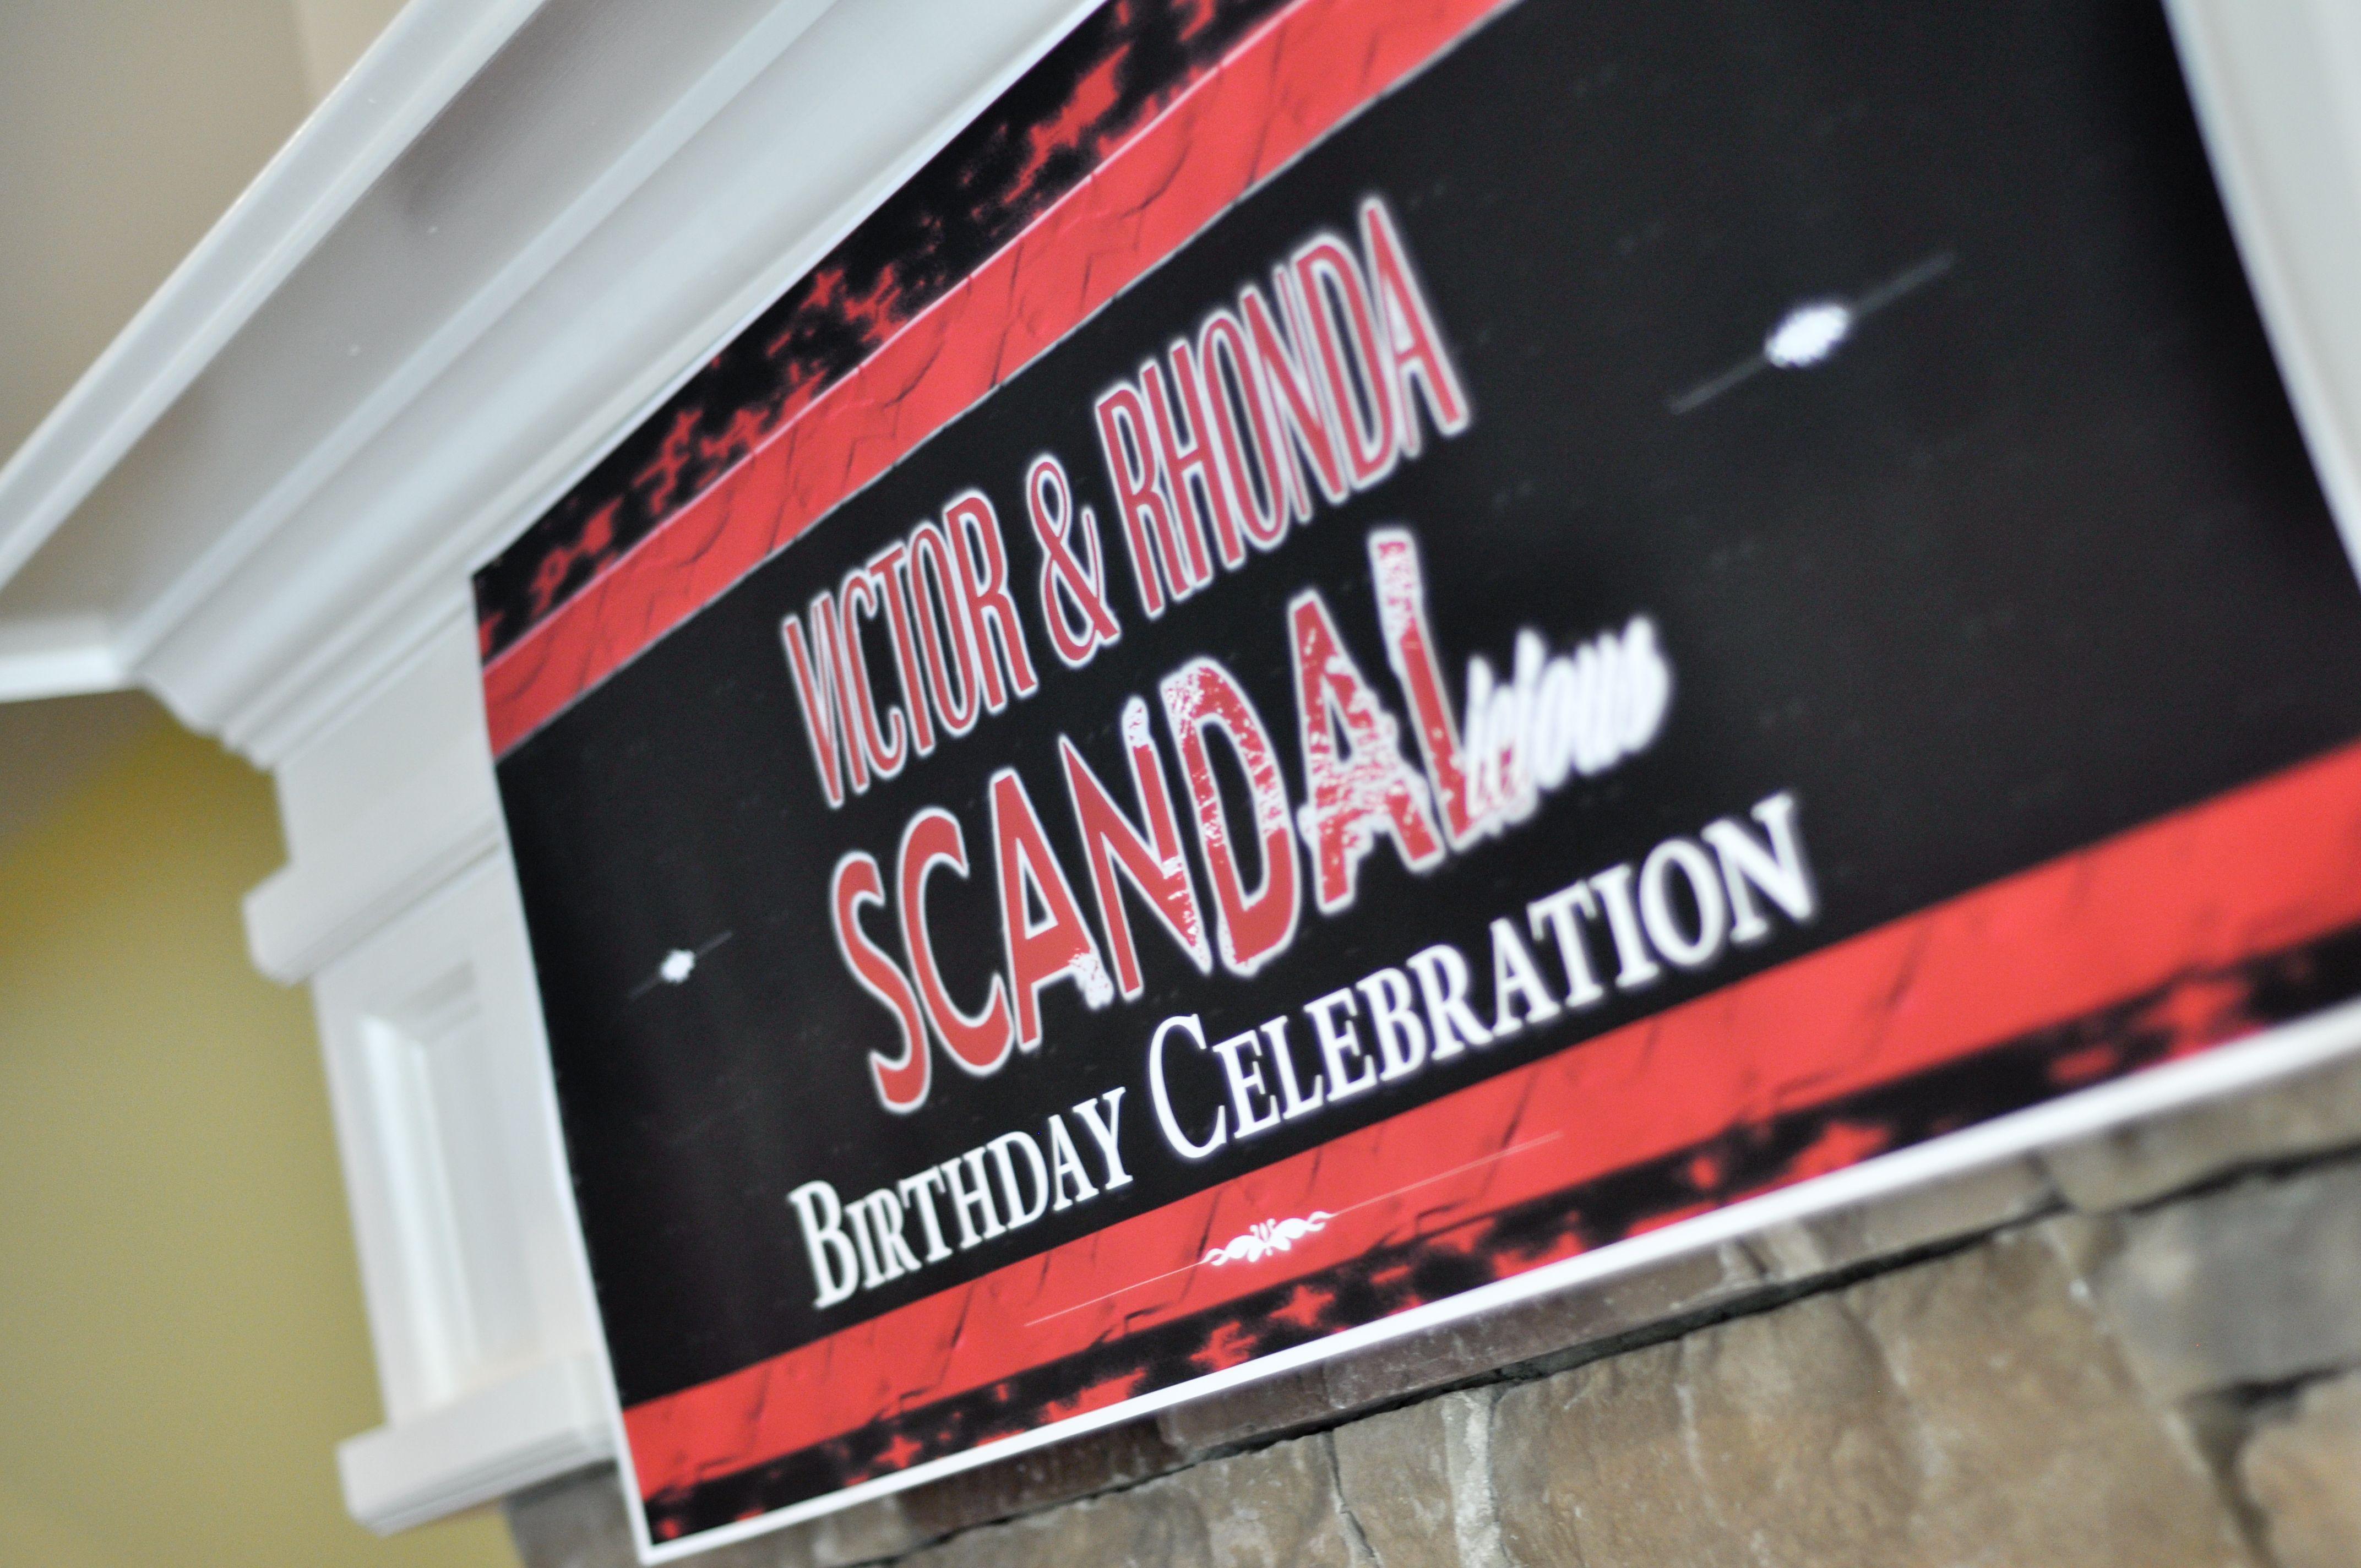 Scandalious Birthday Party